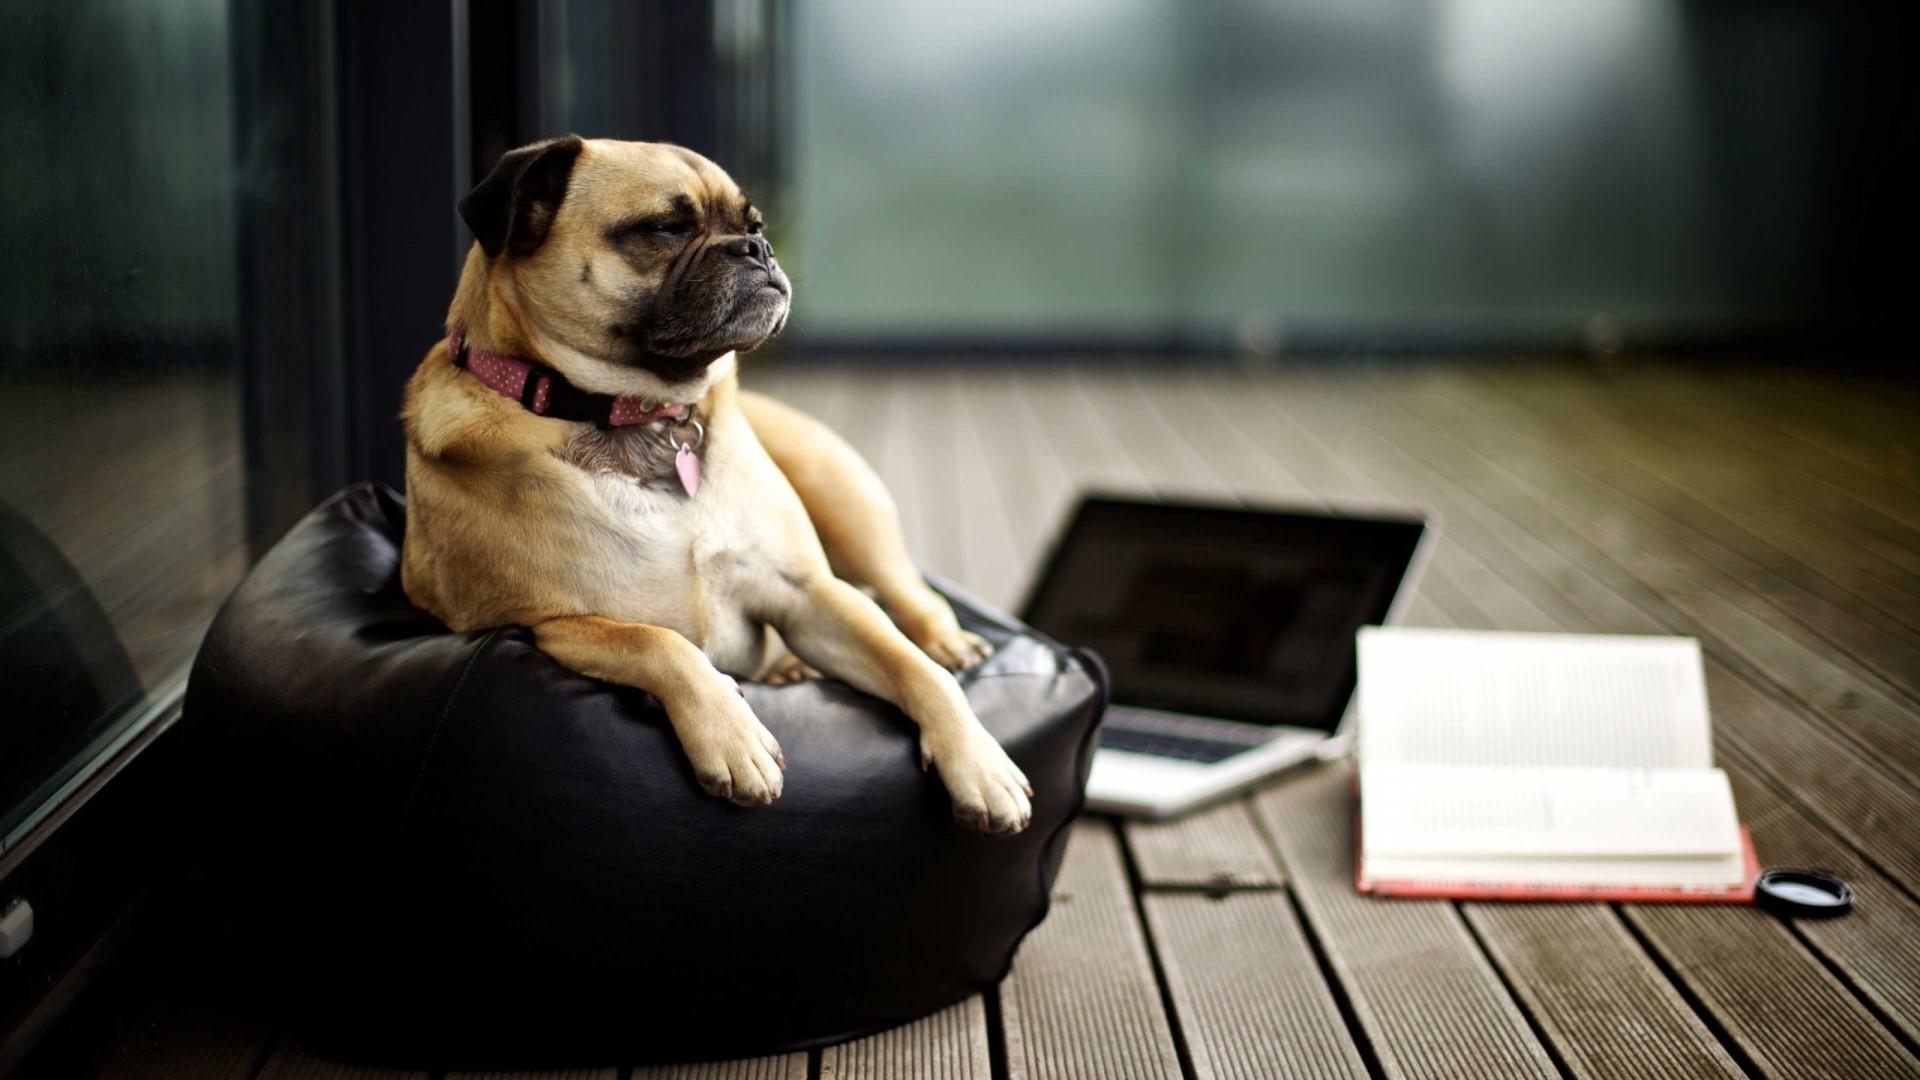 Black Books Dog Laptop Mac Book Pug Puppy Mammal 1920x1080 Px Human Positions Like